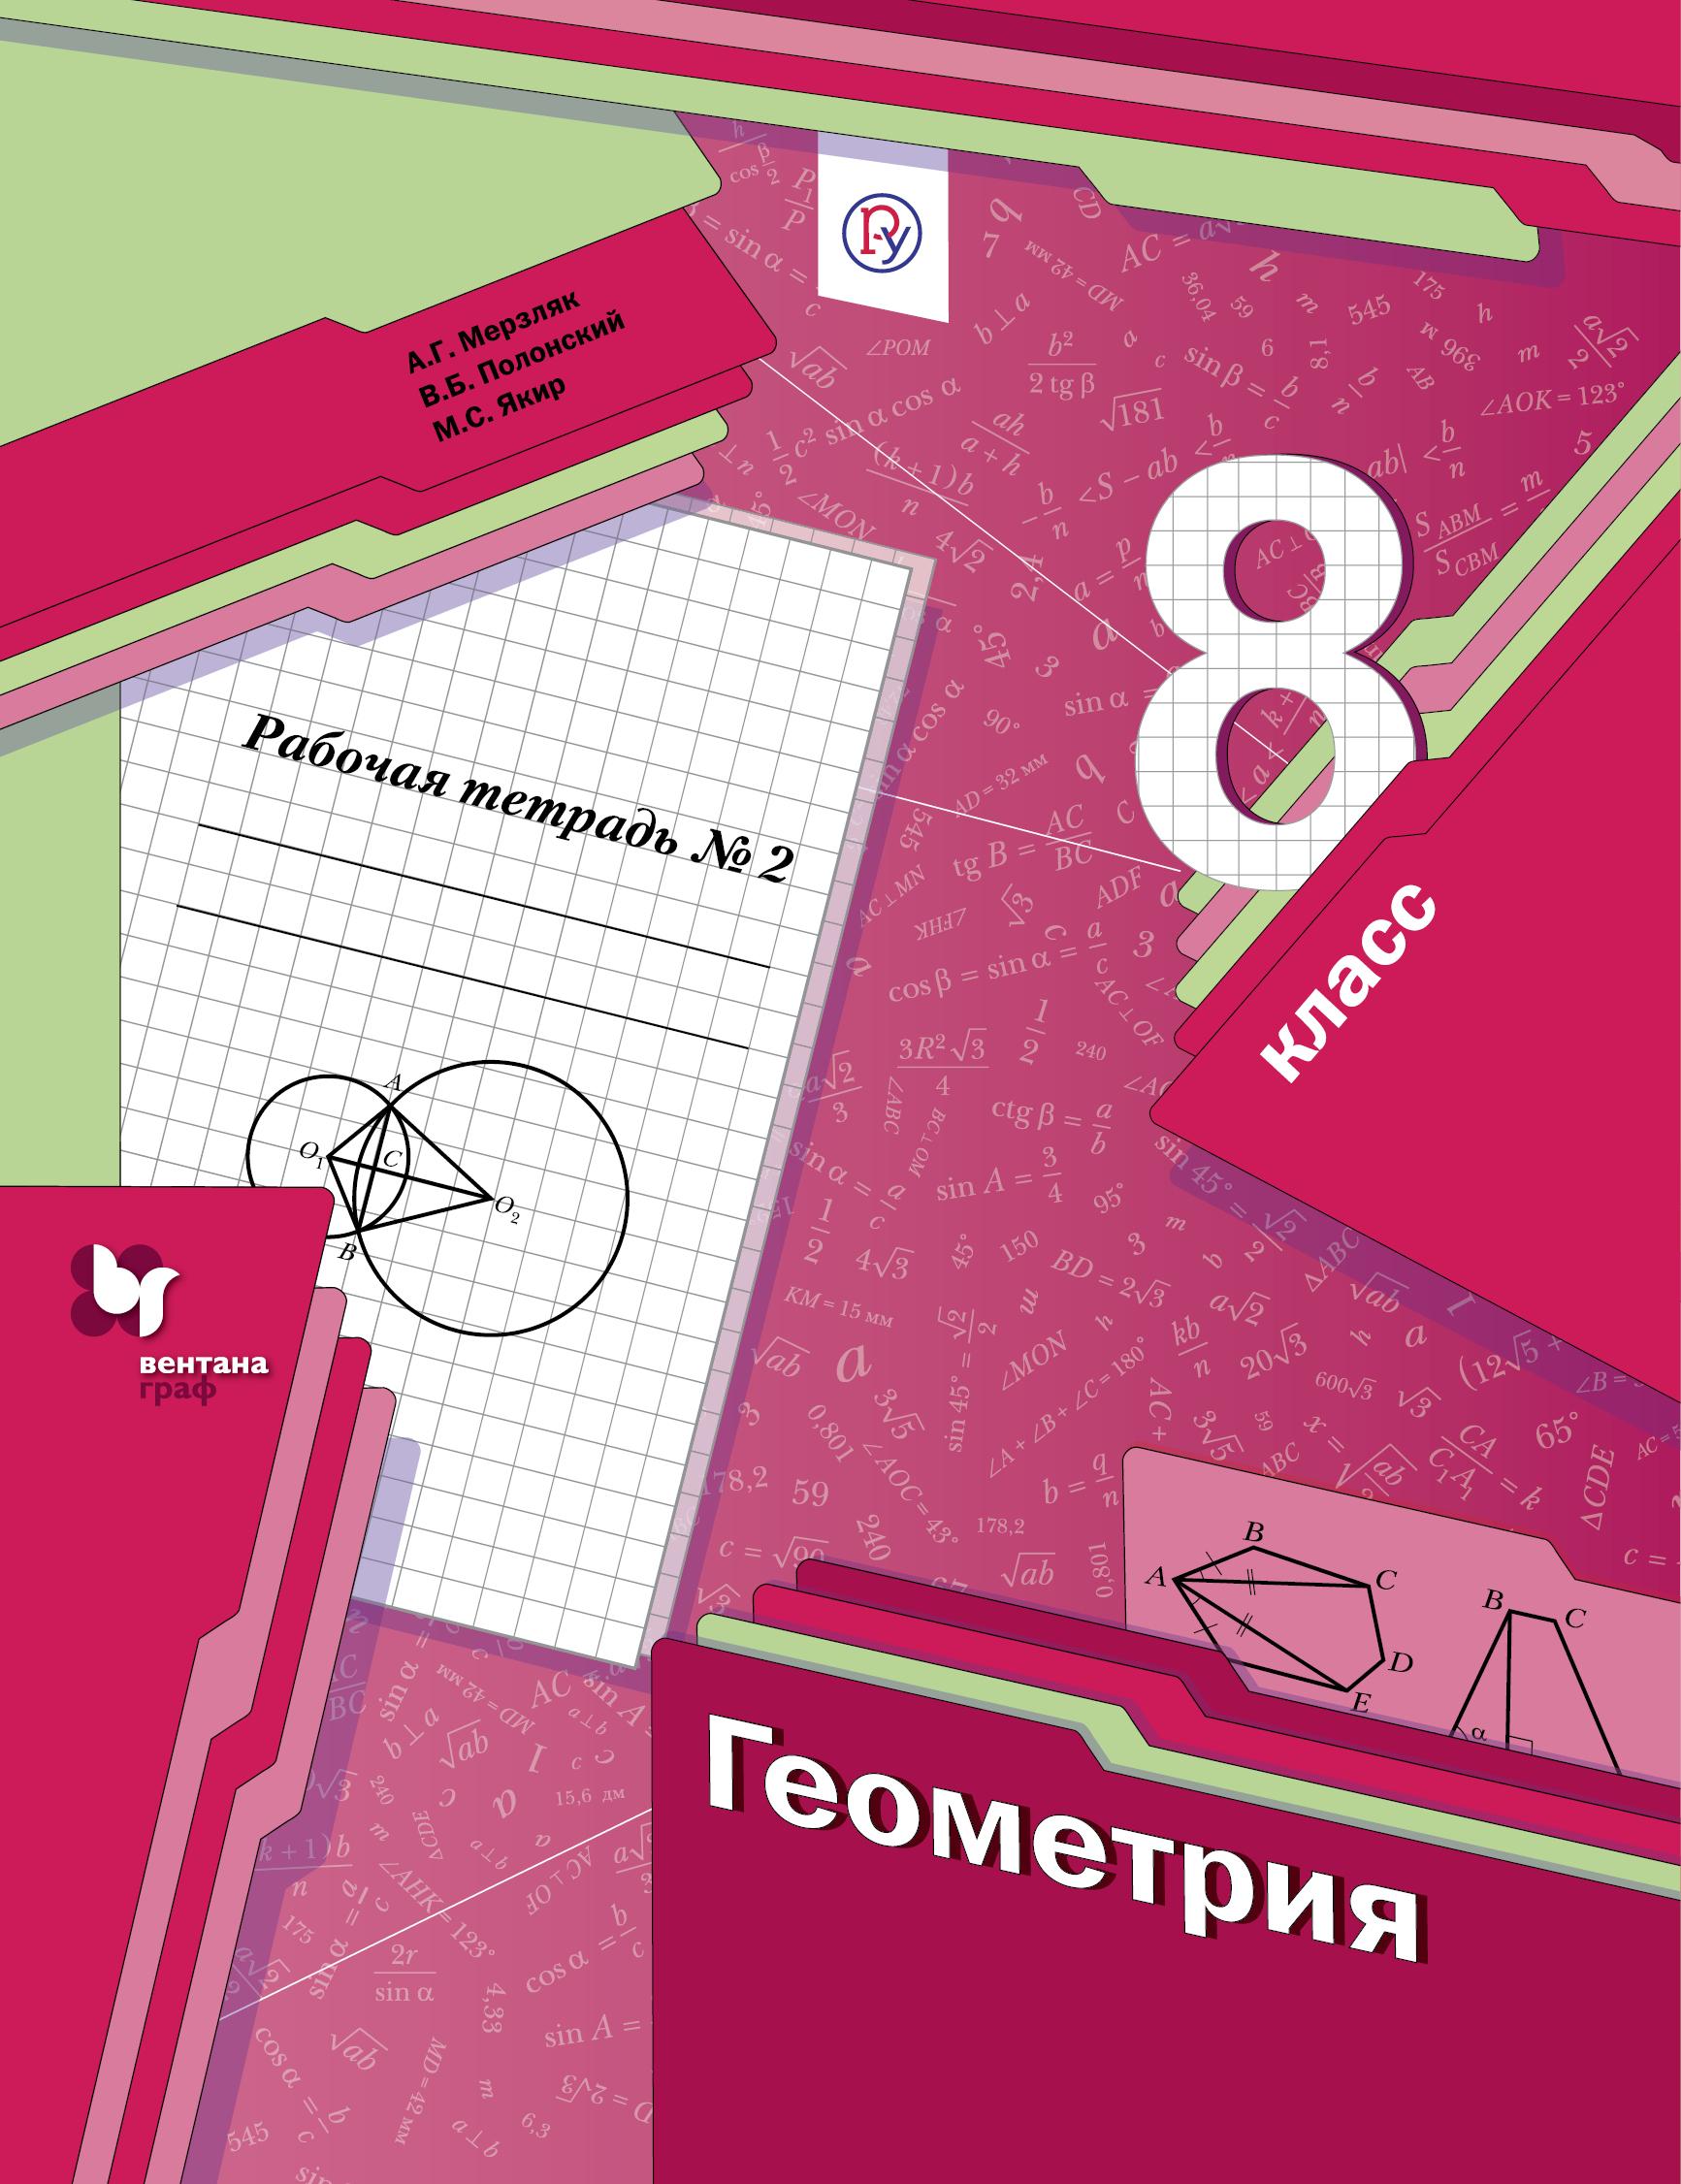 МерзлякА.Г., ПолонскийВ.Б., ЯкирМ.С. Геометрия. 8класс. Рабочая тетрадь №2. цены онлайн